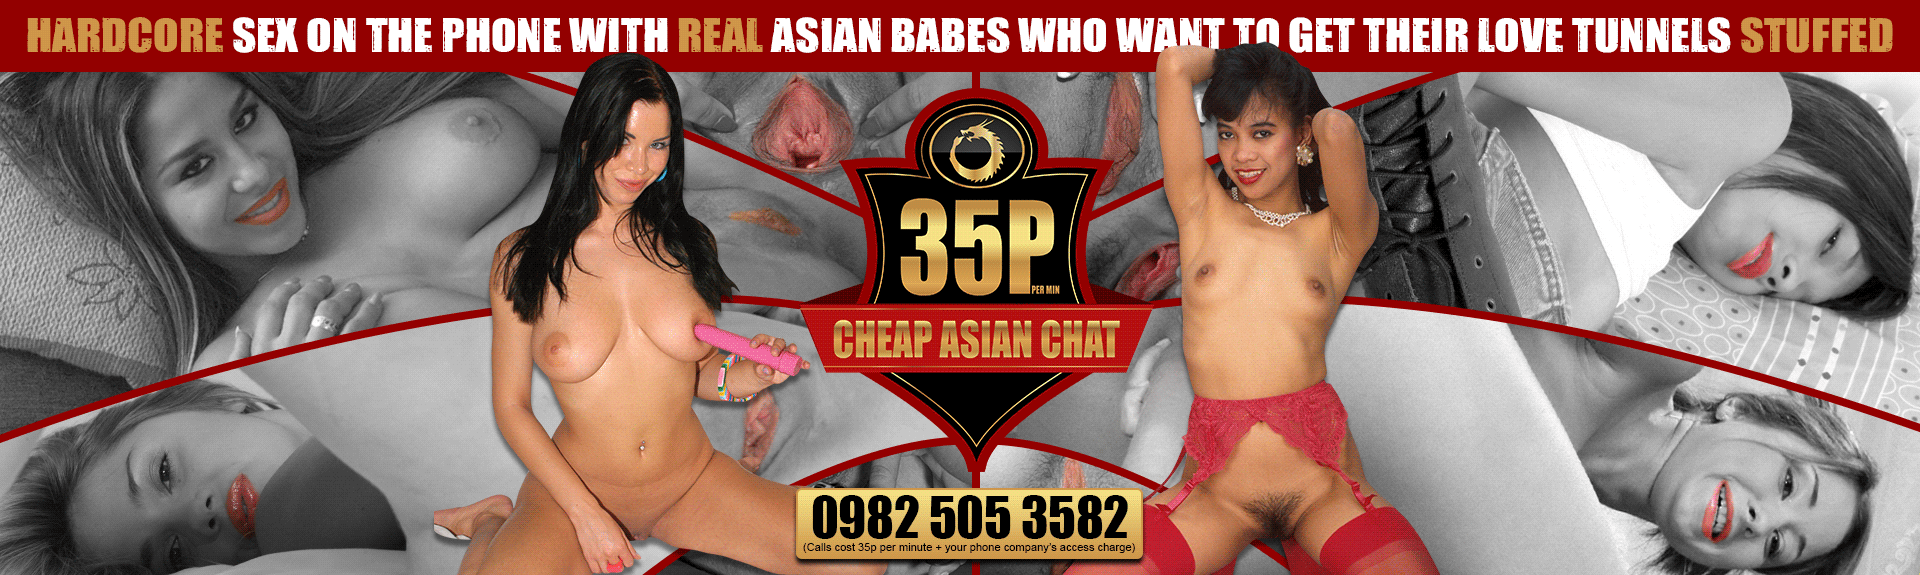 cheap-asian-chat-header